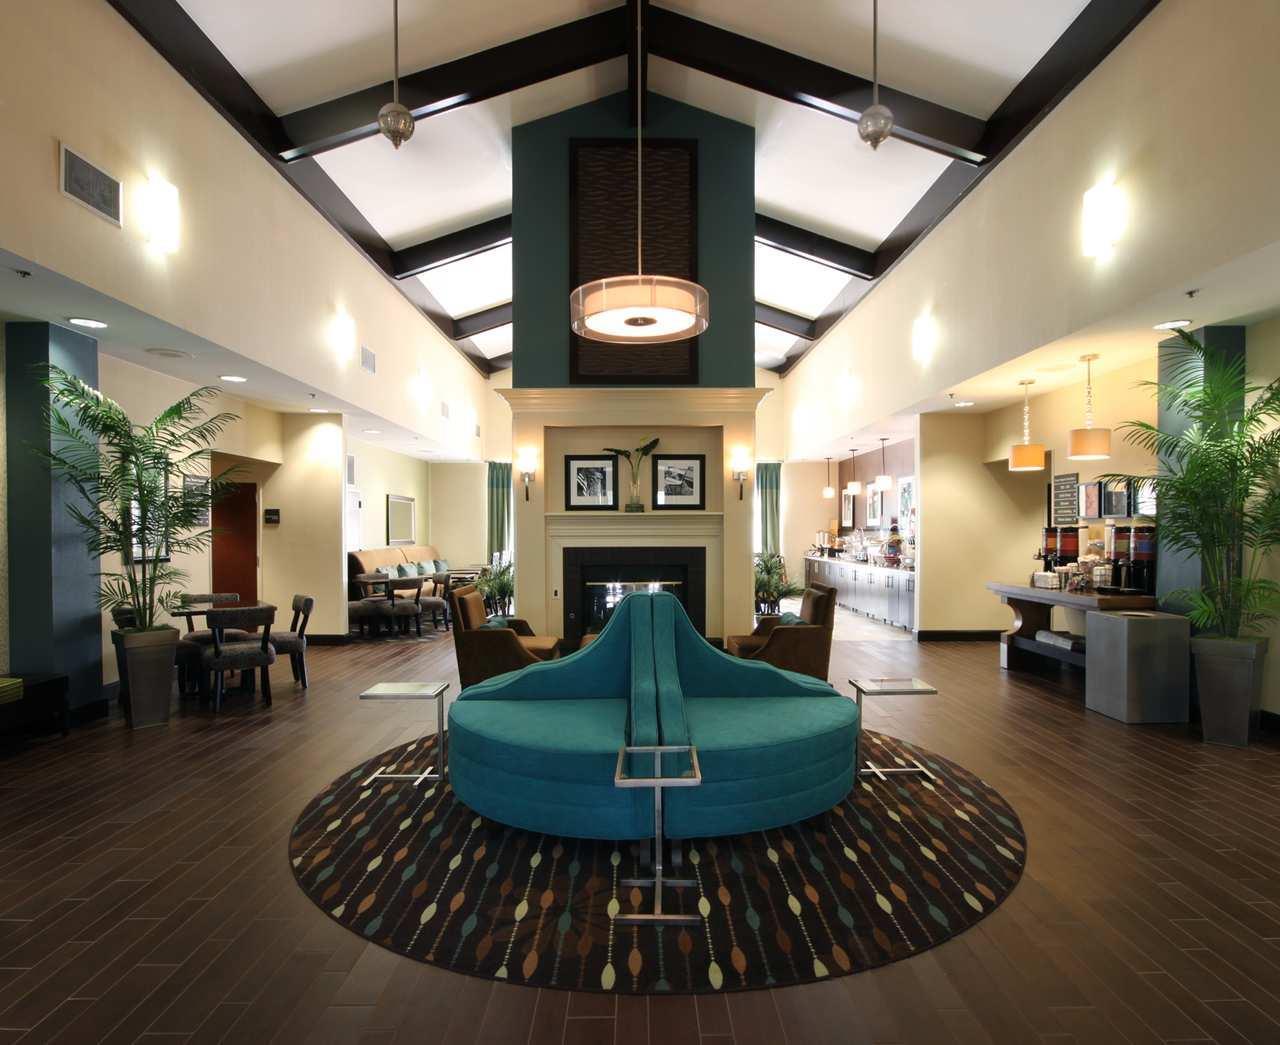 Hampton Inn & Suites Nashville/Franklin (Cool Springs)